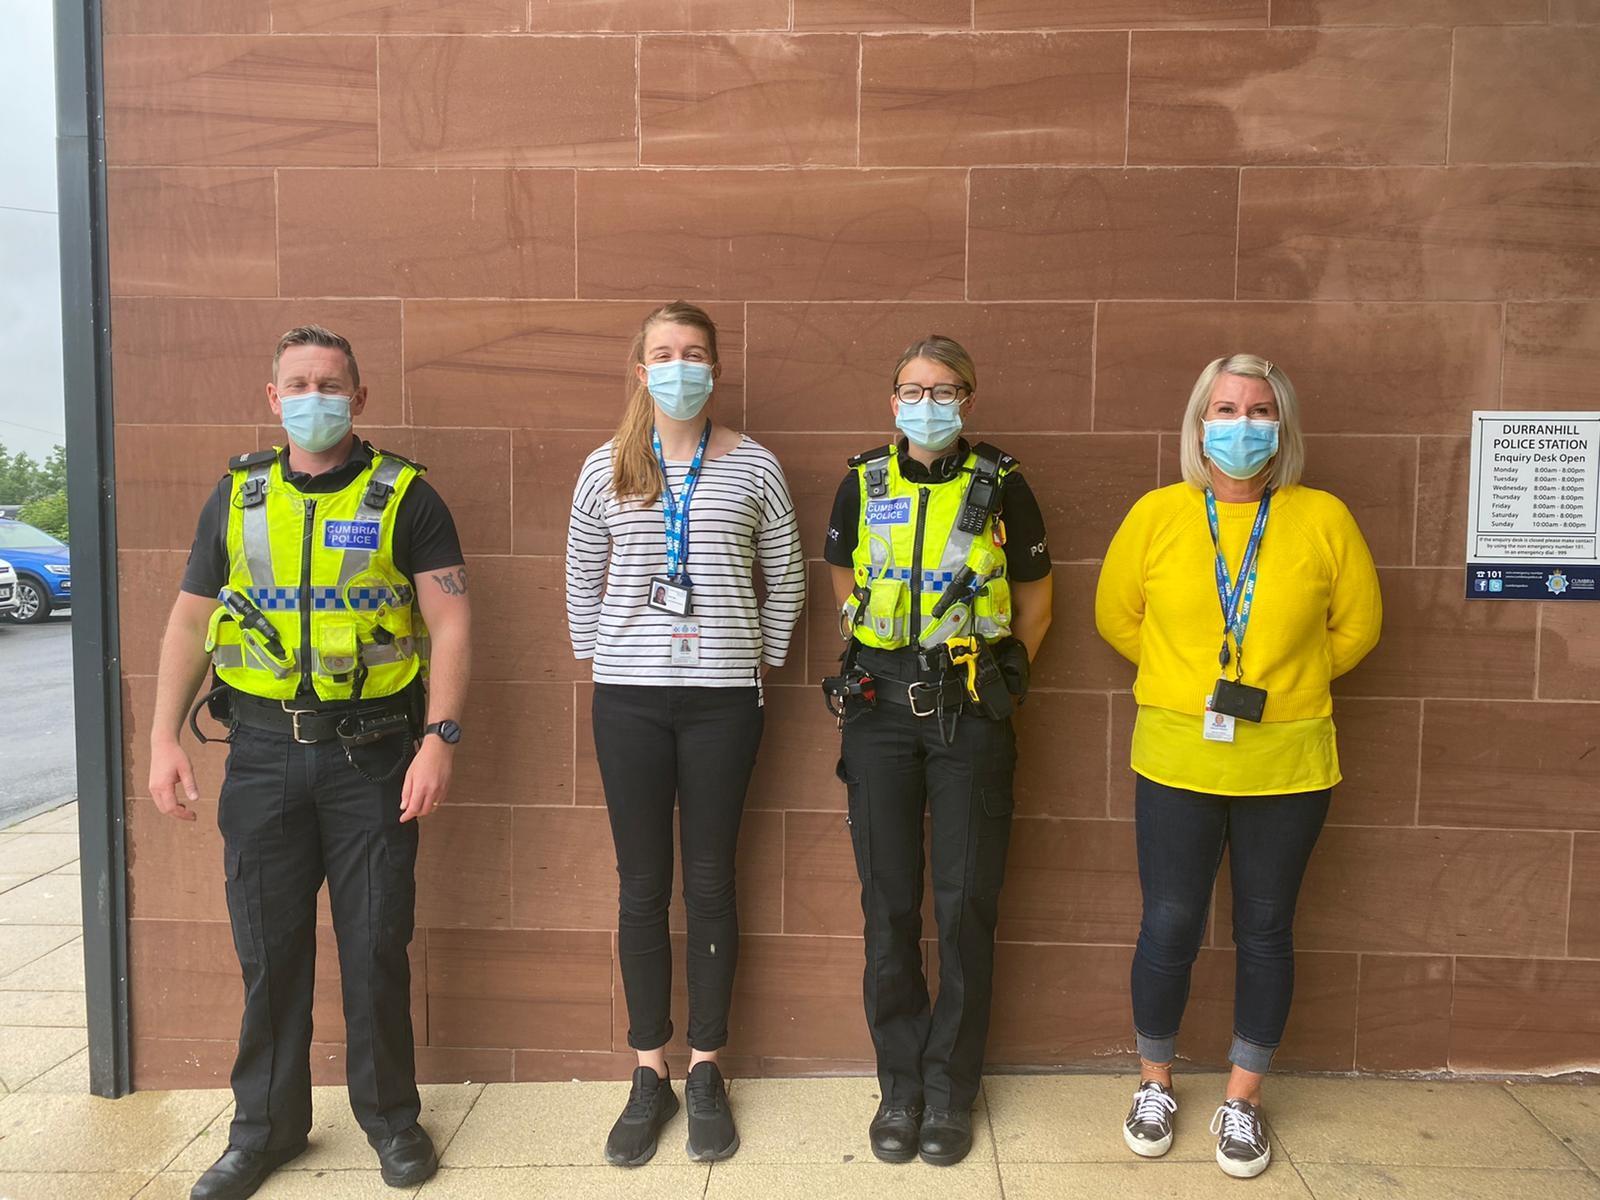 PC Chris Rudd, Registered Mental Health Nurse Katie Pymm, PC Alice Simpson and Registered Mental Health Nurse Deborah Mawson.